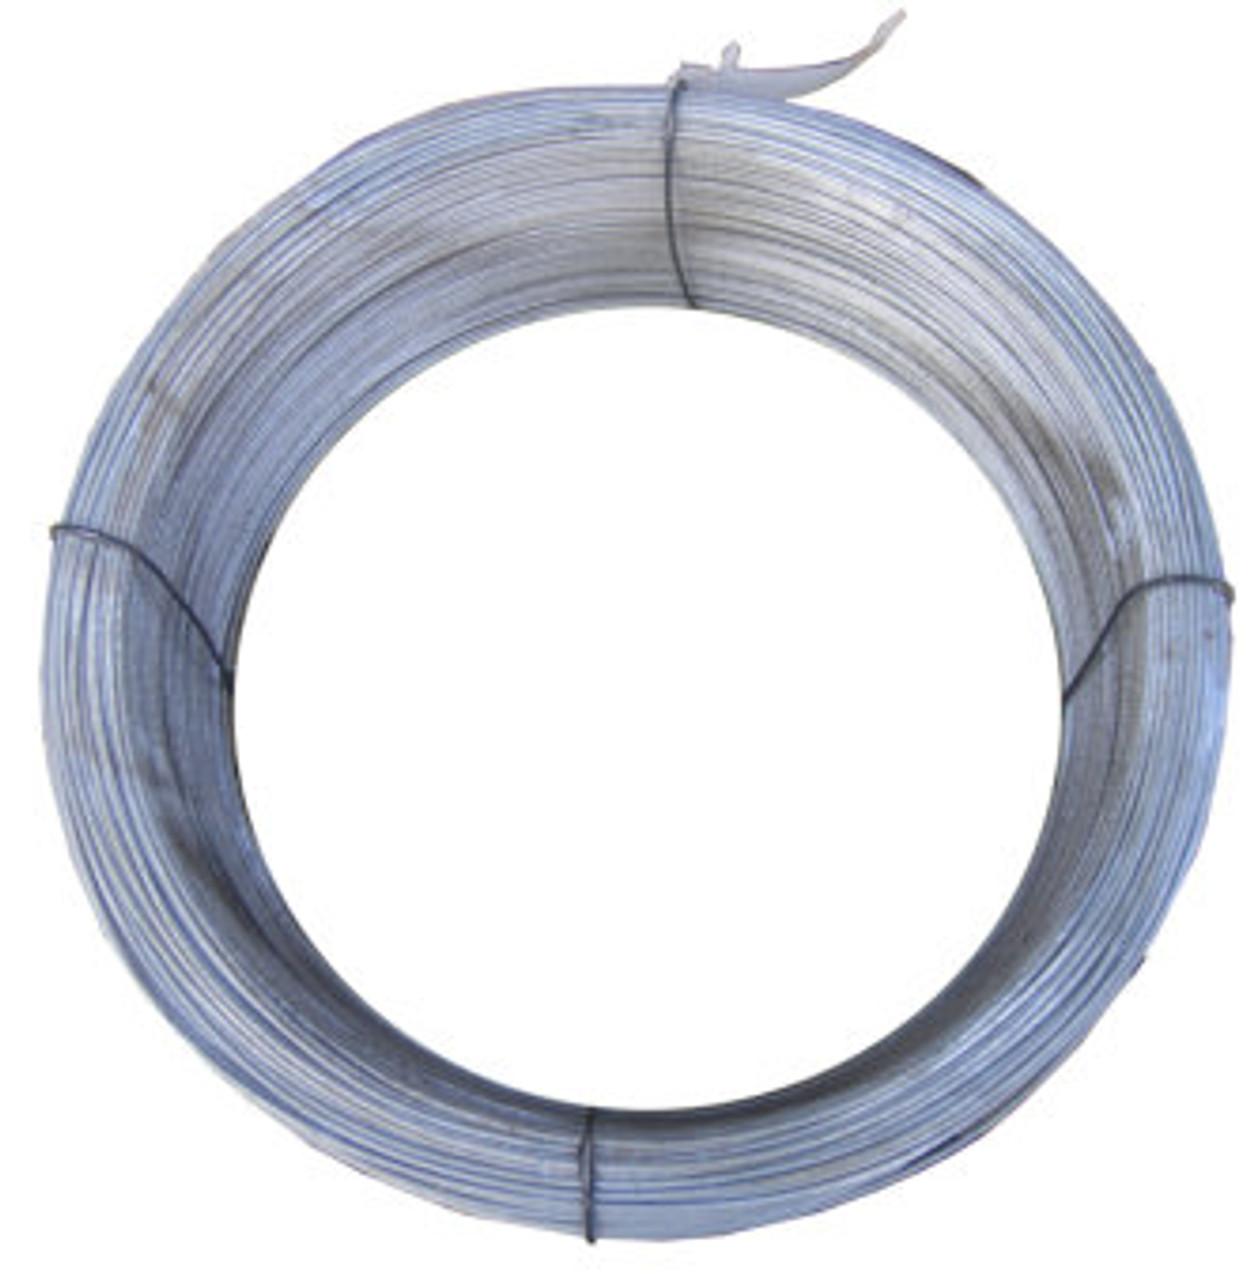 9 gauge galvanized utility wire